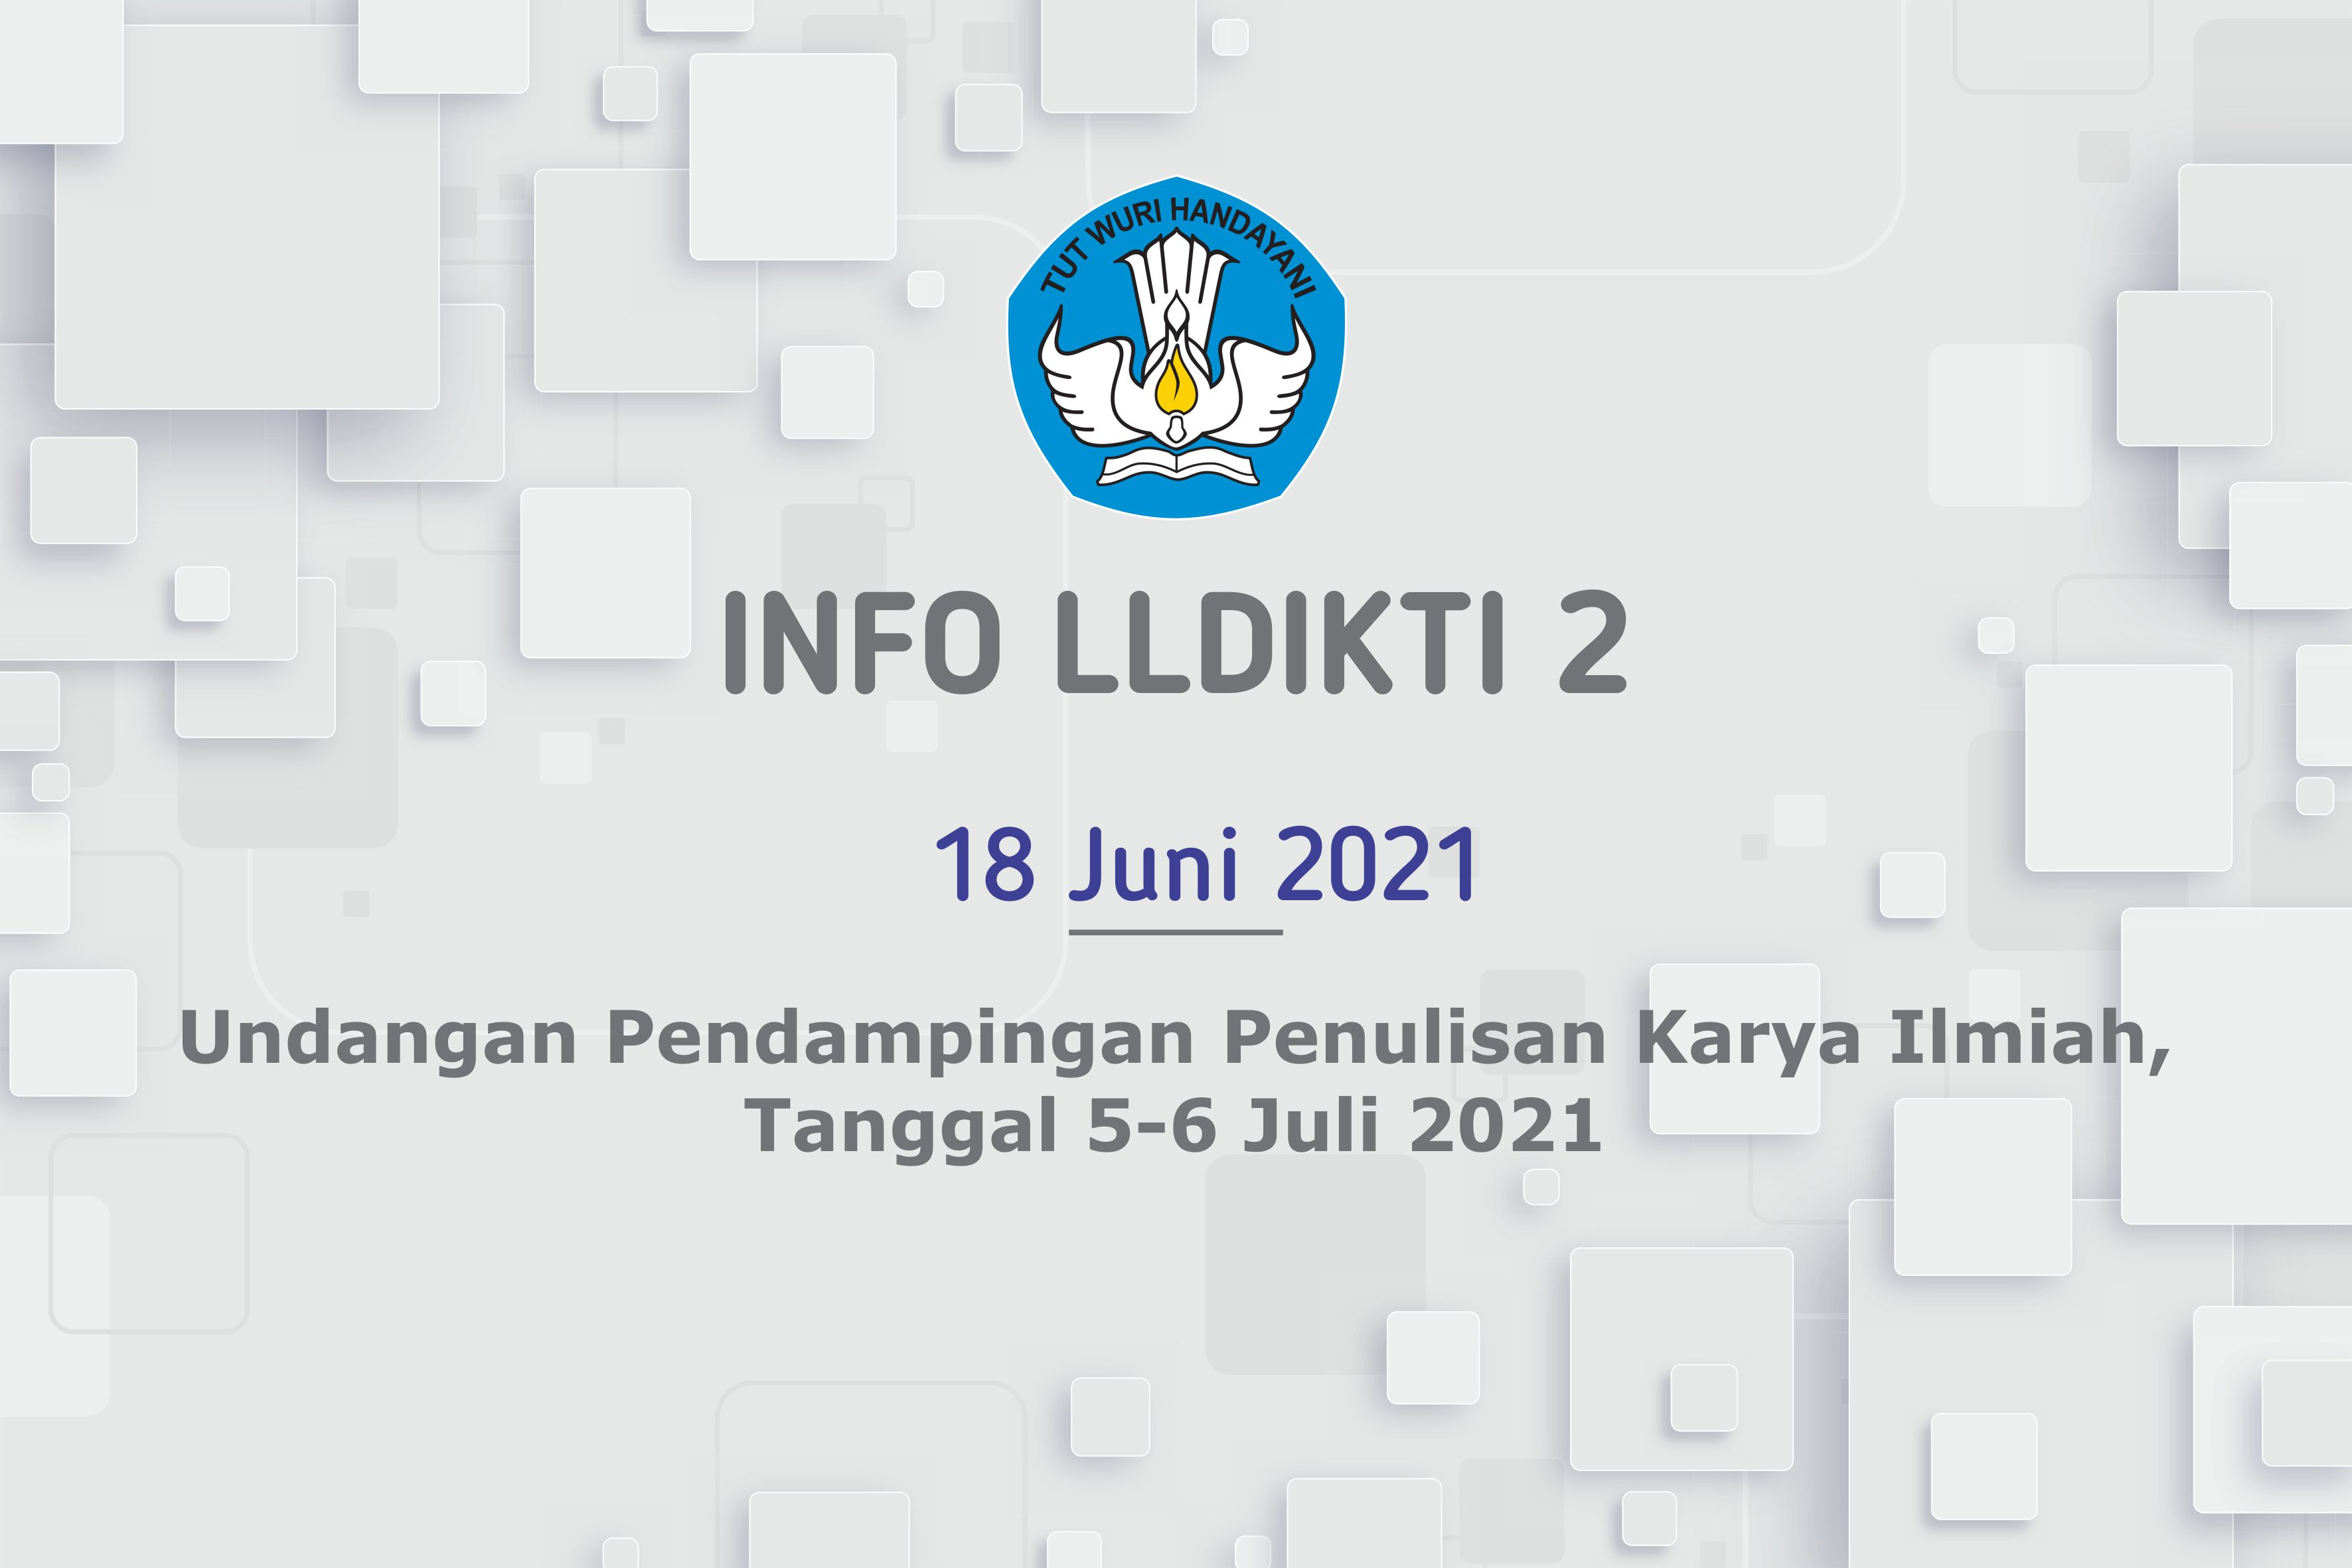 Undangan Pendampingan Penulisan Karya Ilmiah, Tanggal 5-6 Juli 2021